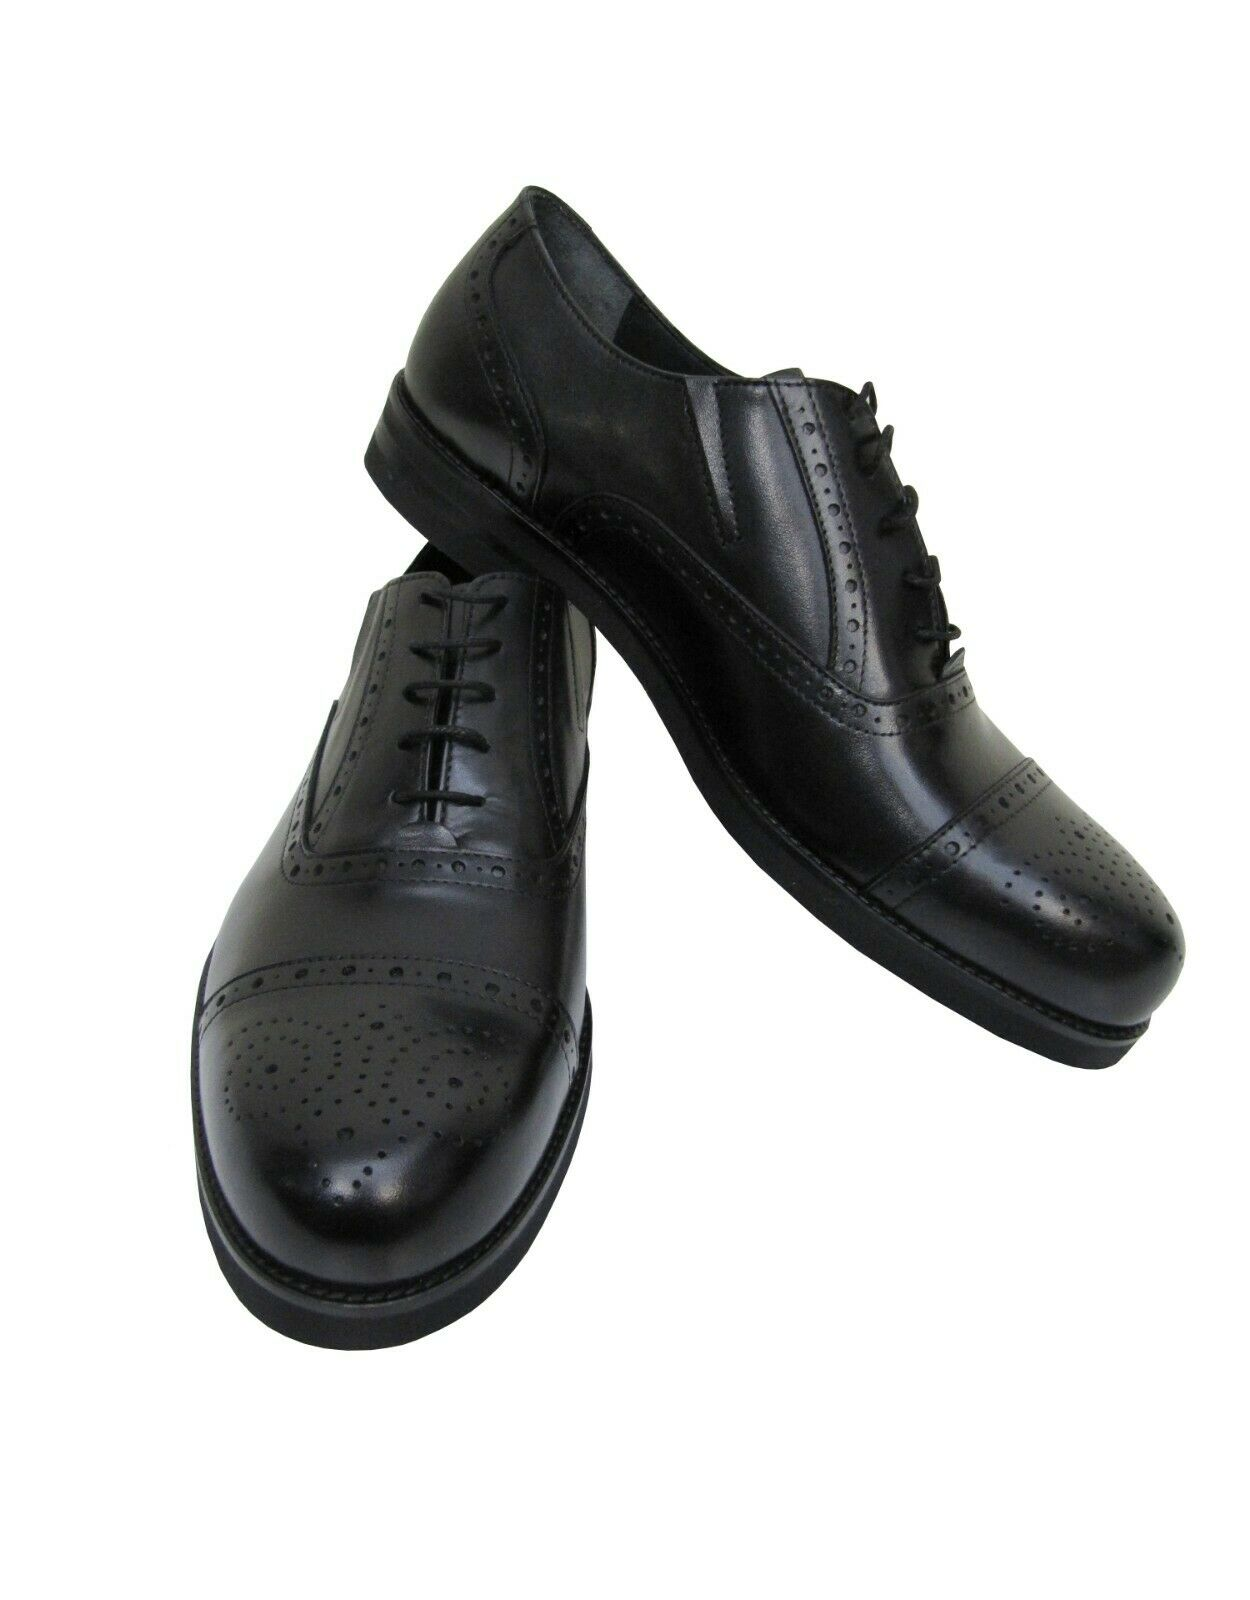 Herren Schuhe echt Leder Klassisch Gr.46 Schwarz Schwarz Schwarz  44e311